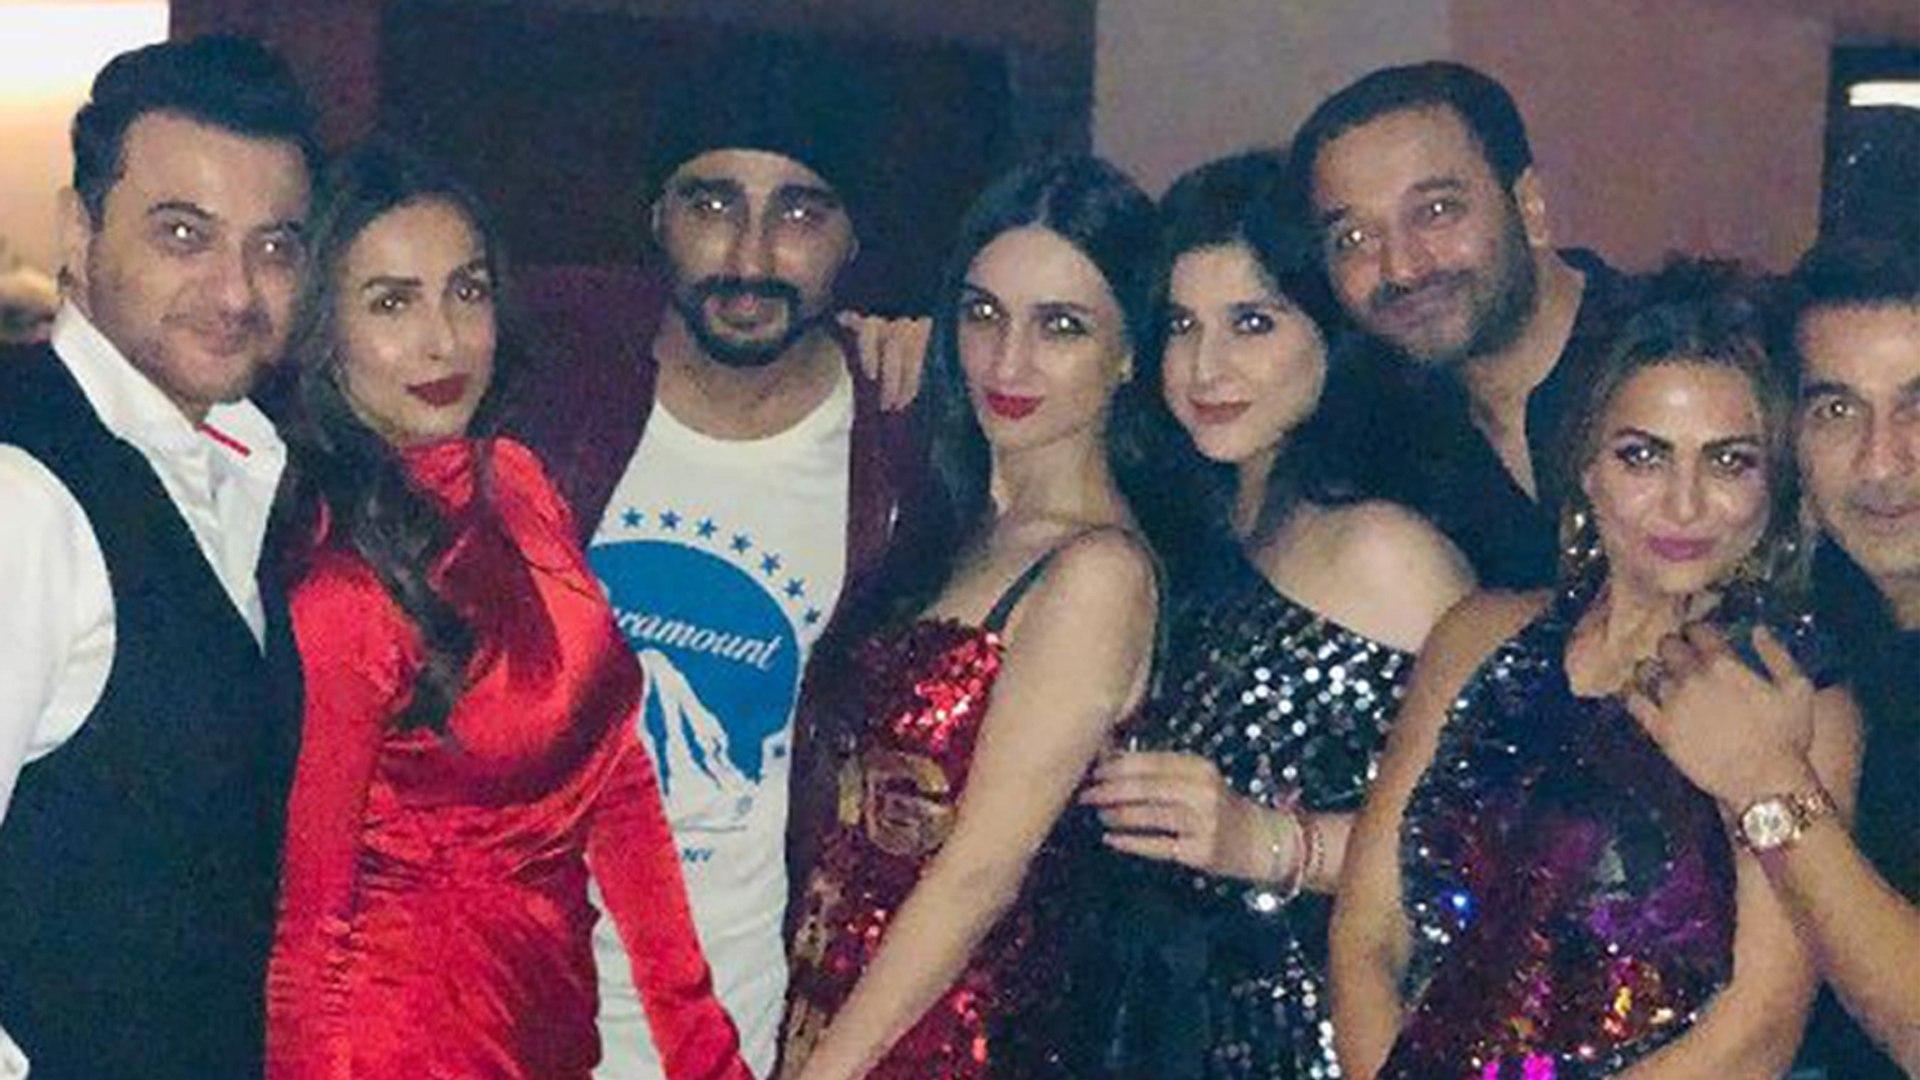 Arjun Kapoor & Malaika Arora celebrate Christmas together at Ritesh Sidhwani's Party | Film